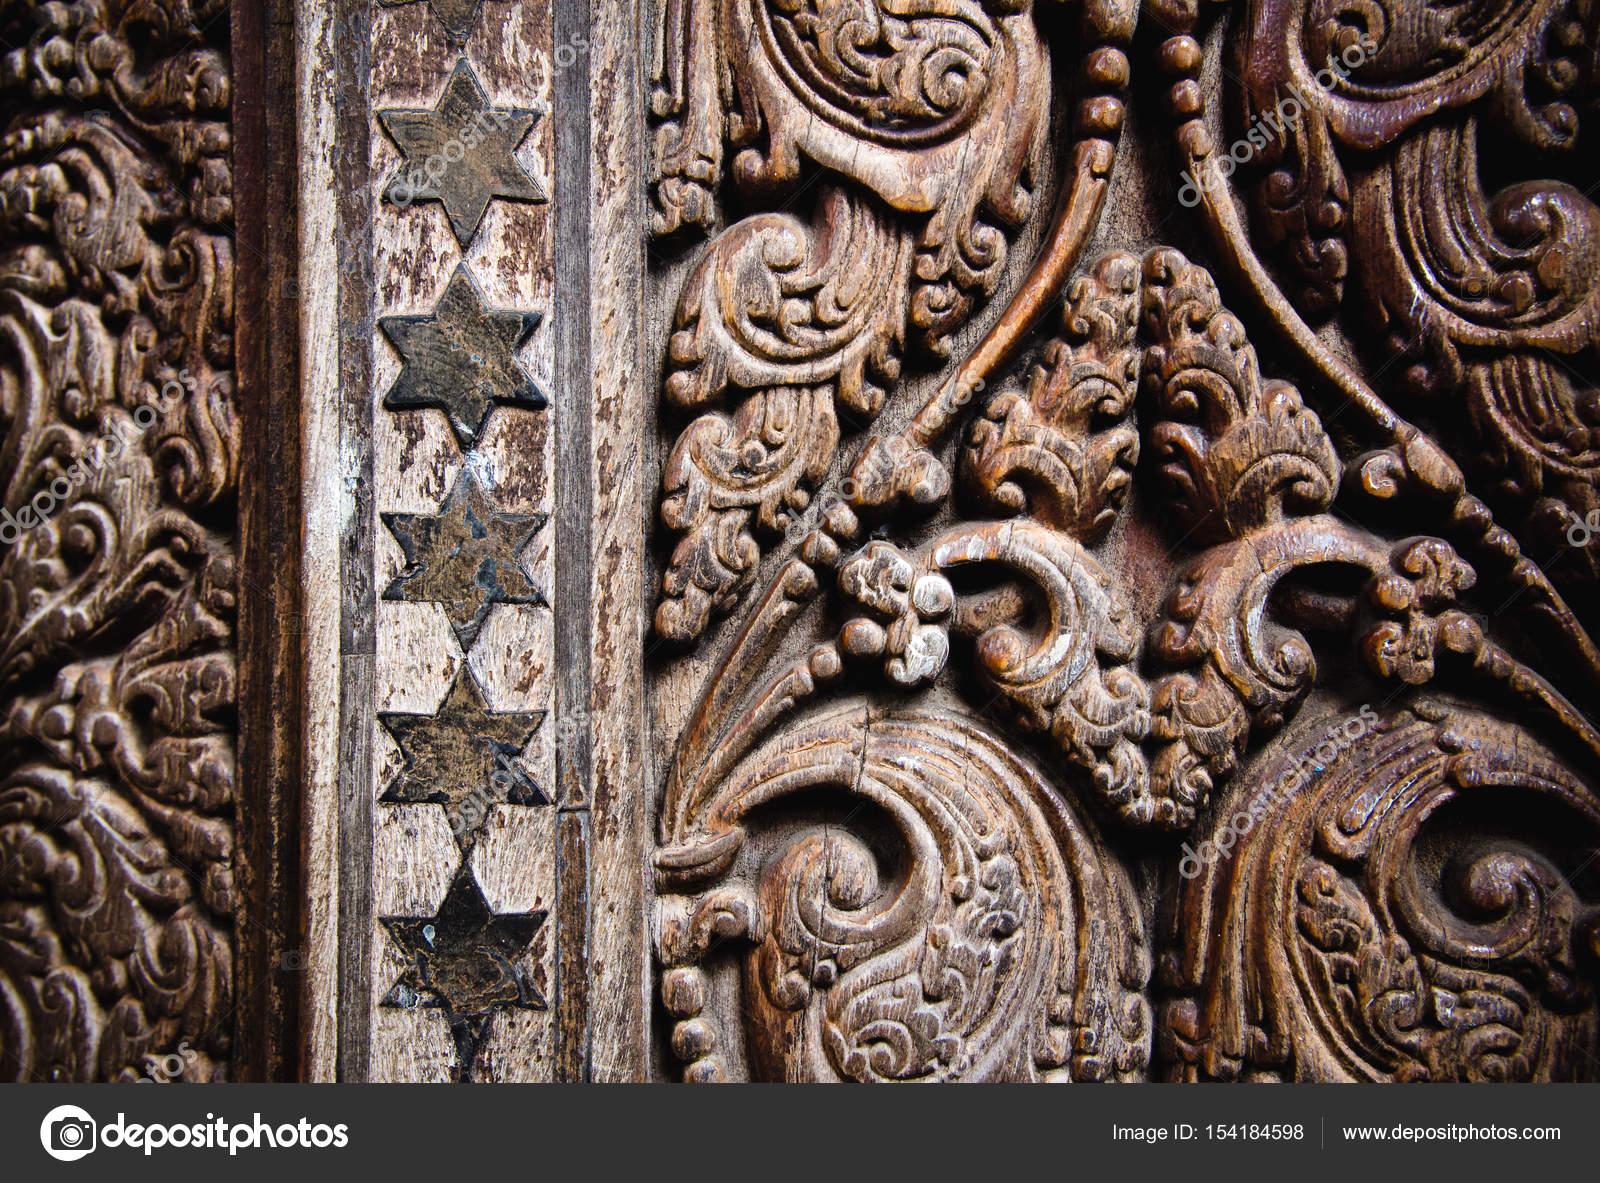 depositphotos stock photo beautiful wood carving on ancient